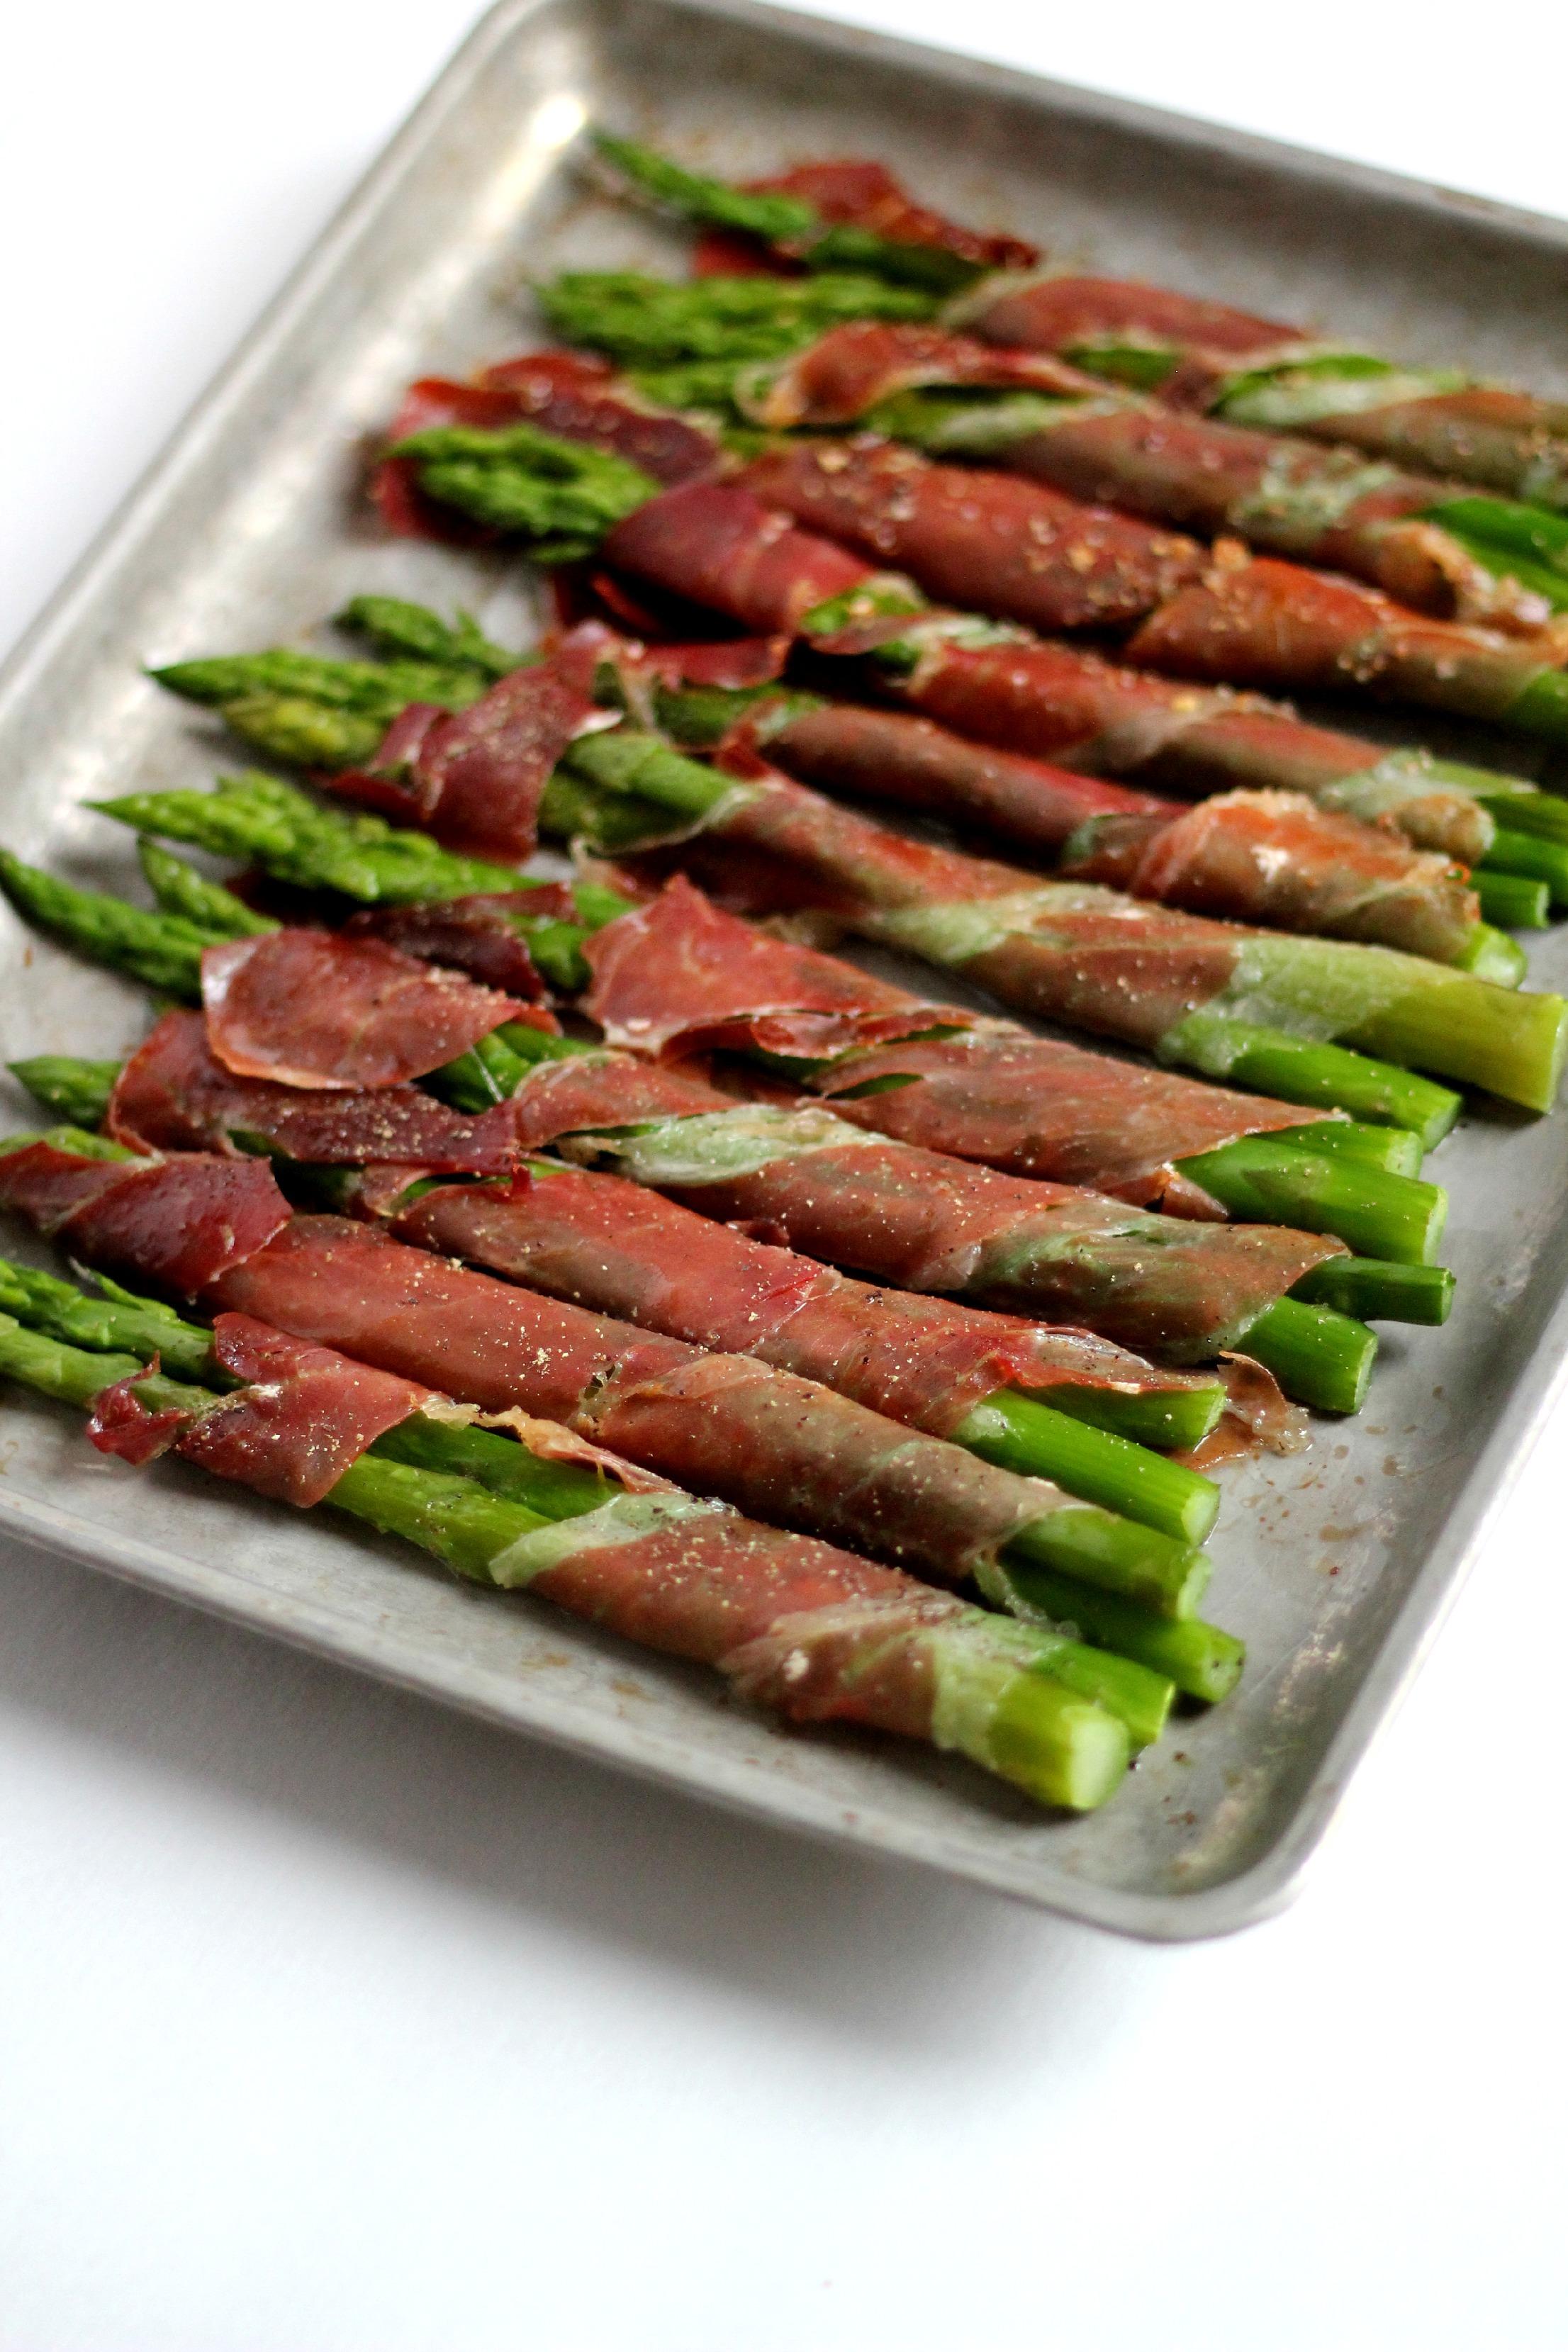 prosciutto-wrapped-asparagus-2